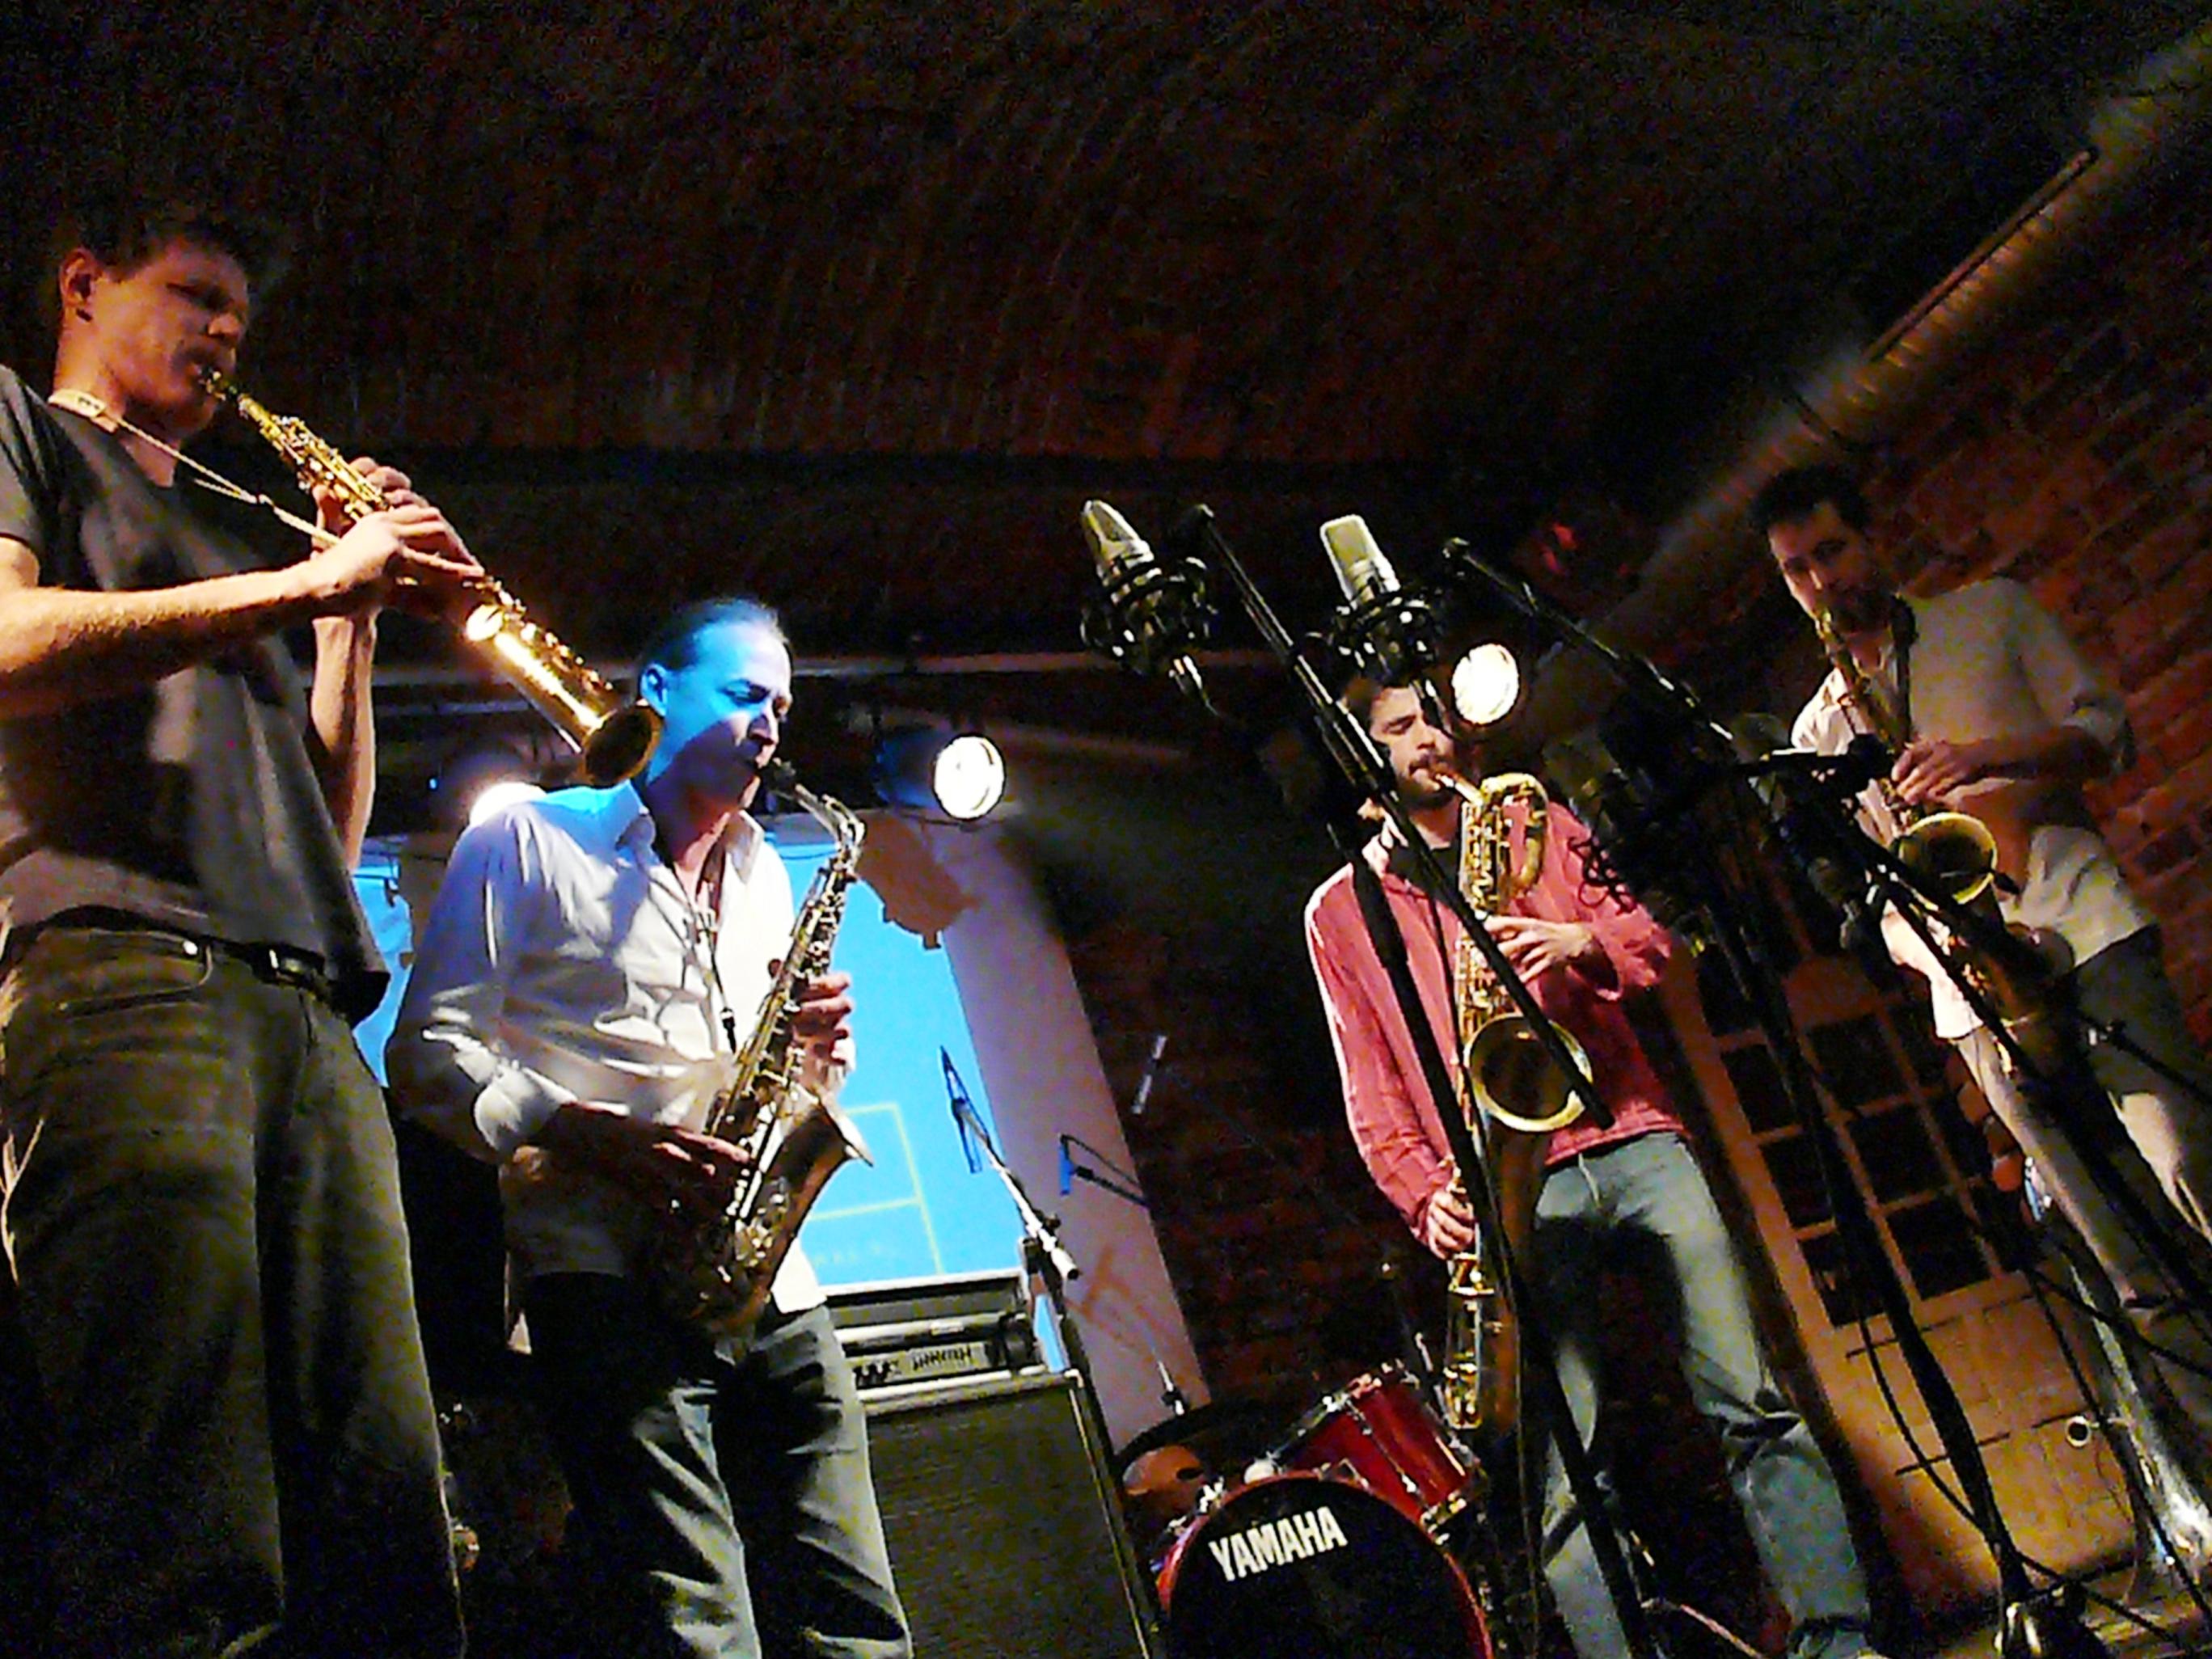 Torben Snekkestad, Michael Niesemann, Julius Gabriel and Per Texas Johansson at Alchemia, Krakow in November 2014